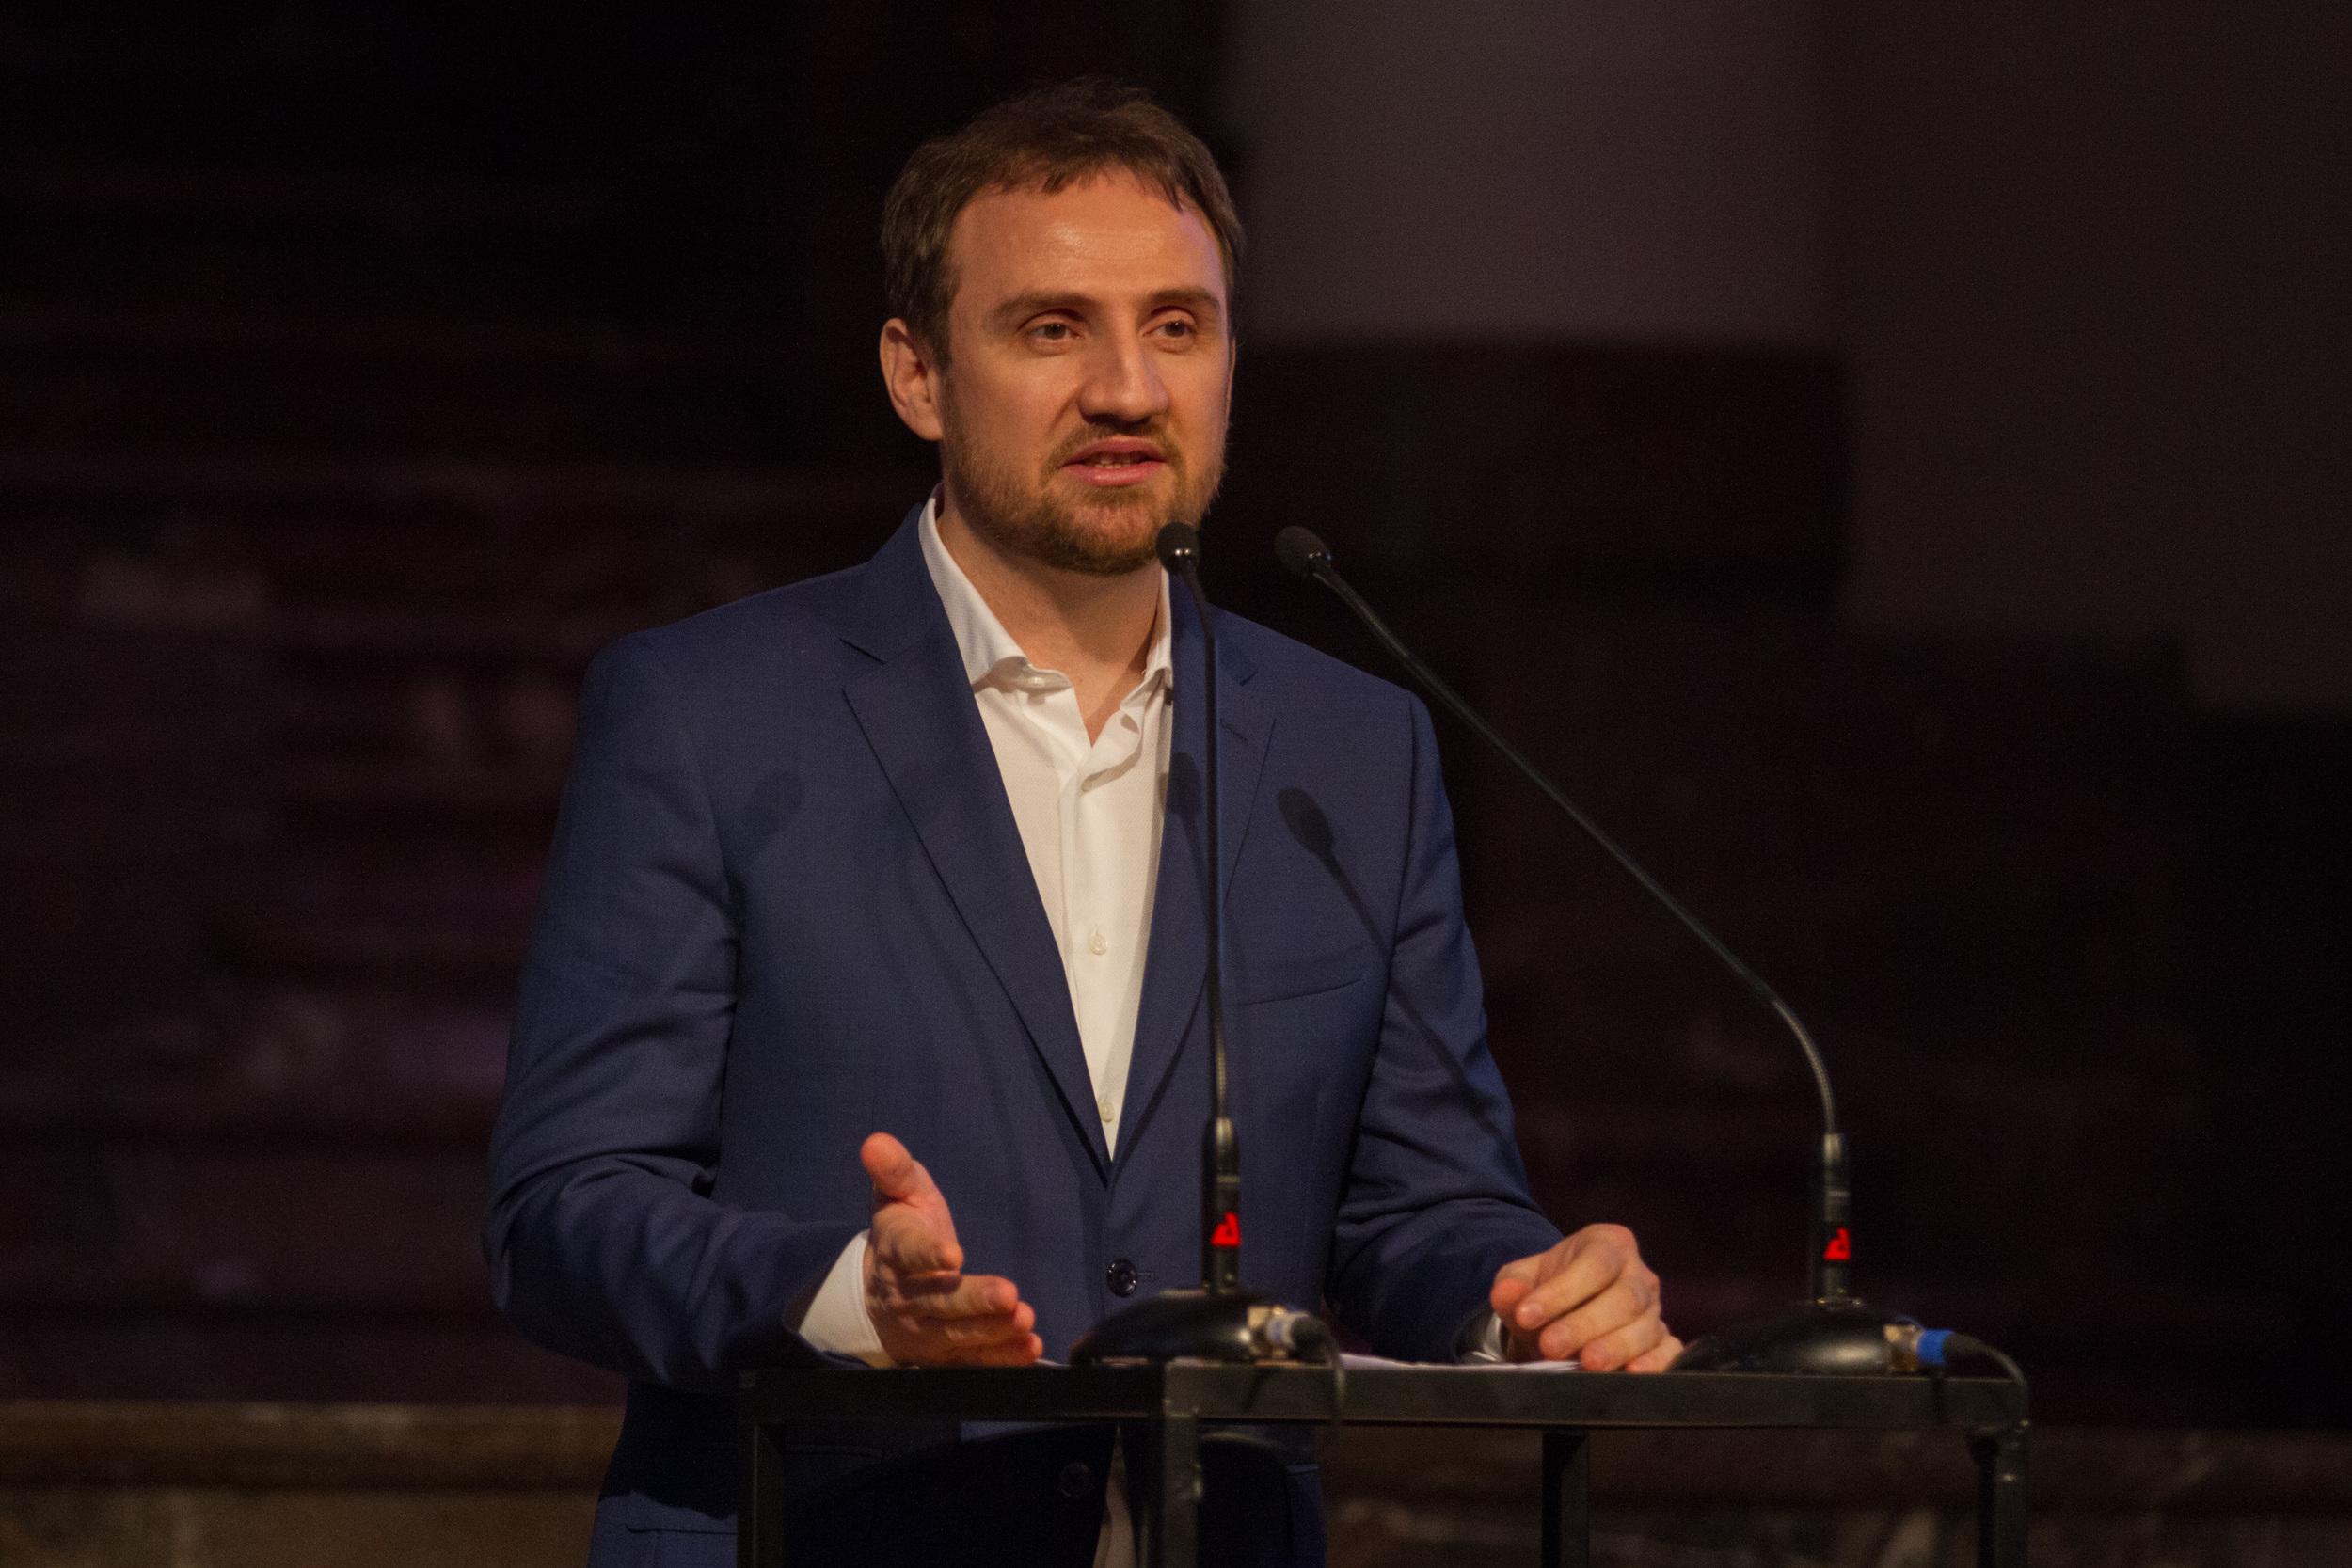 2014 ECF Princess Margriet Laureate Teodor Celakoski. Photo ©Xander Remkes.